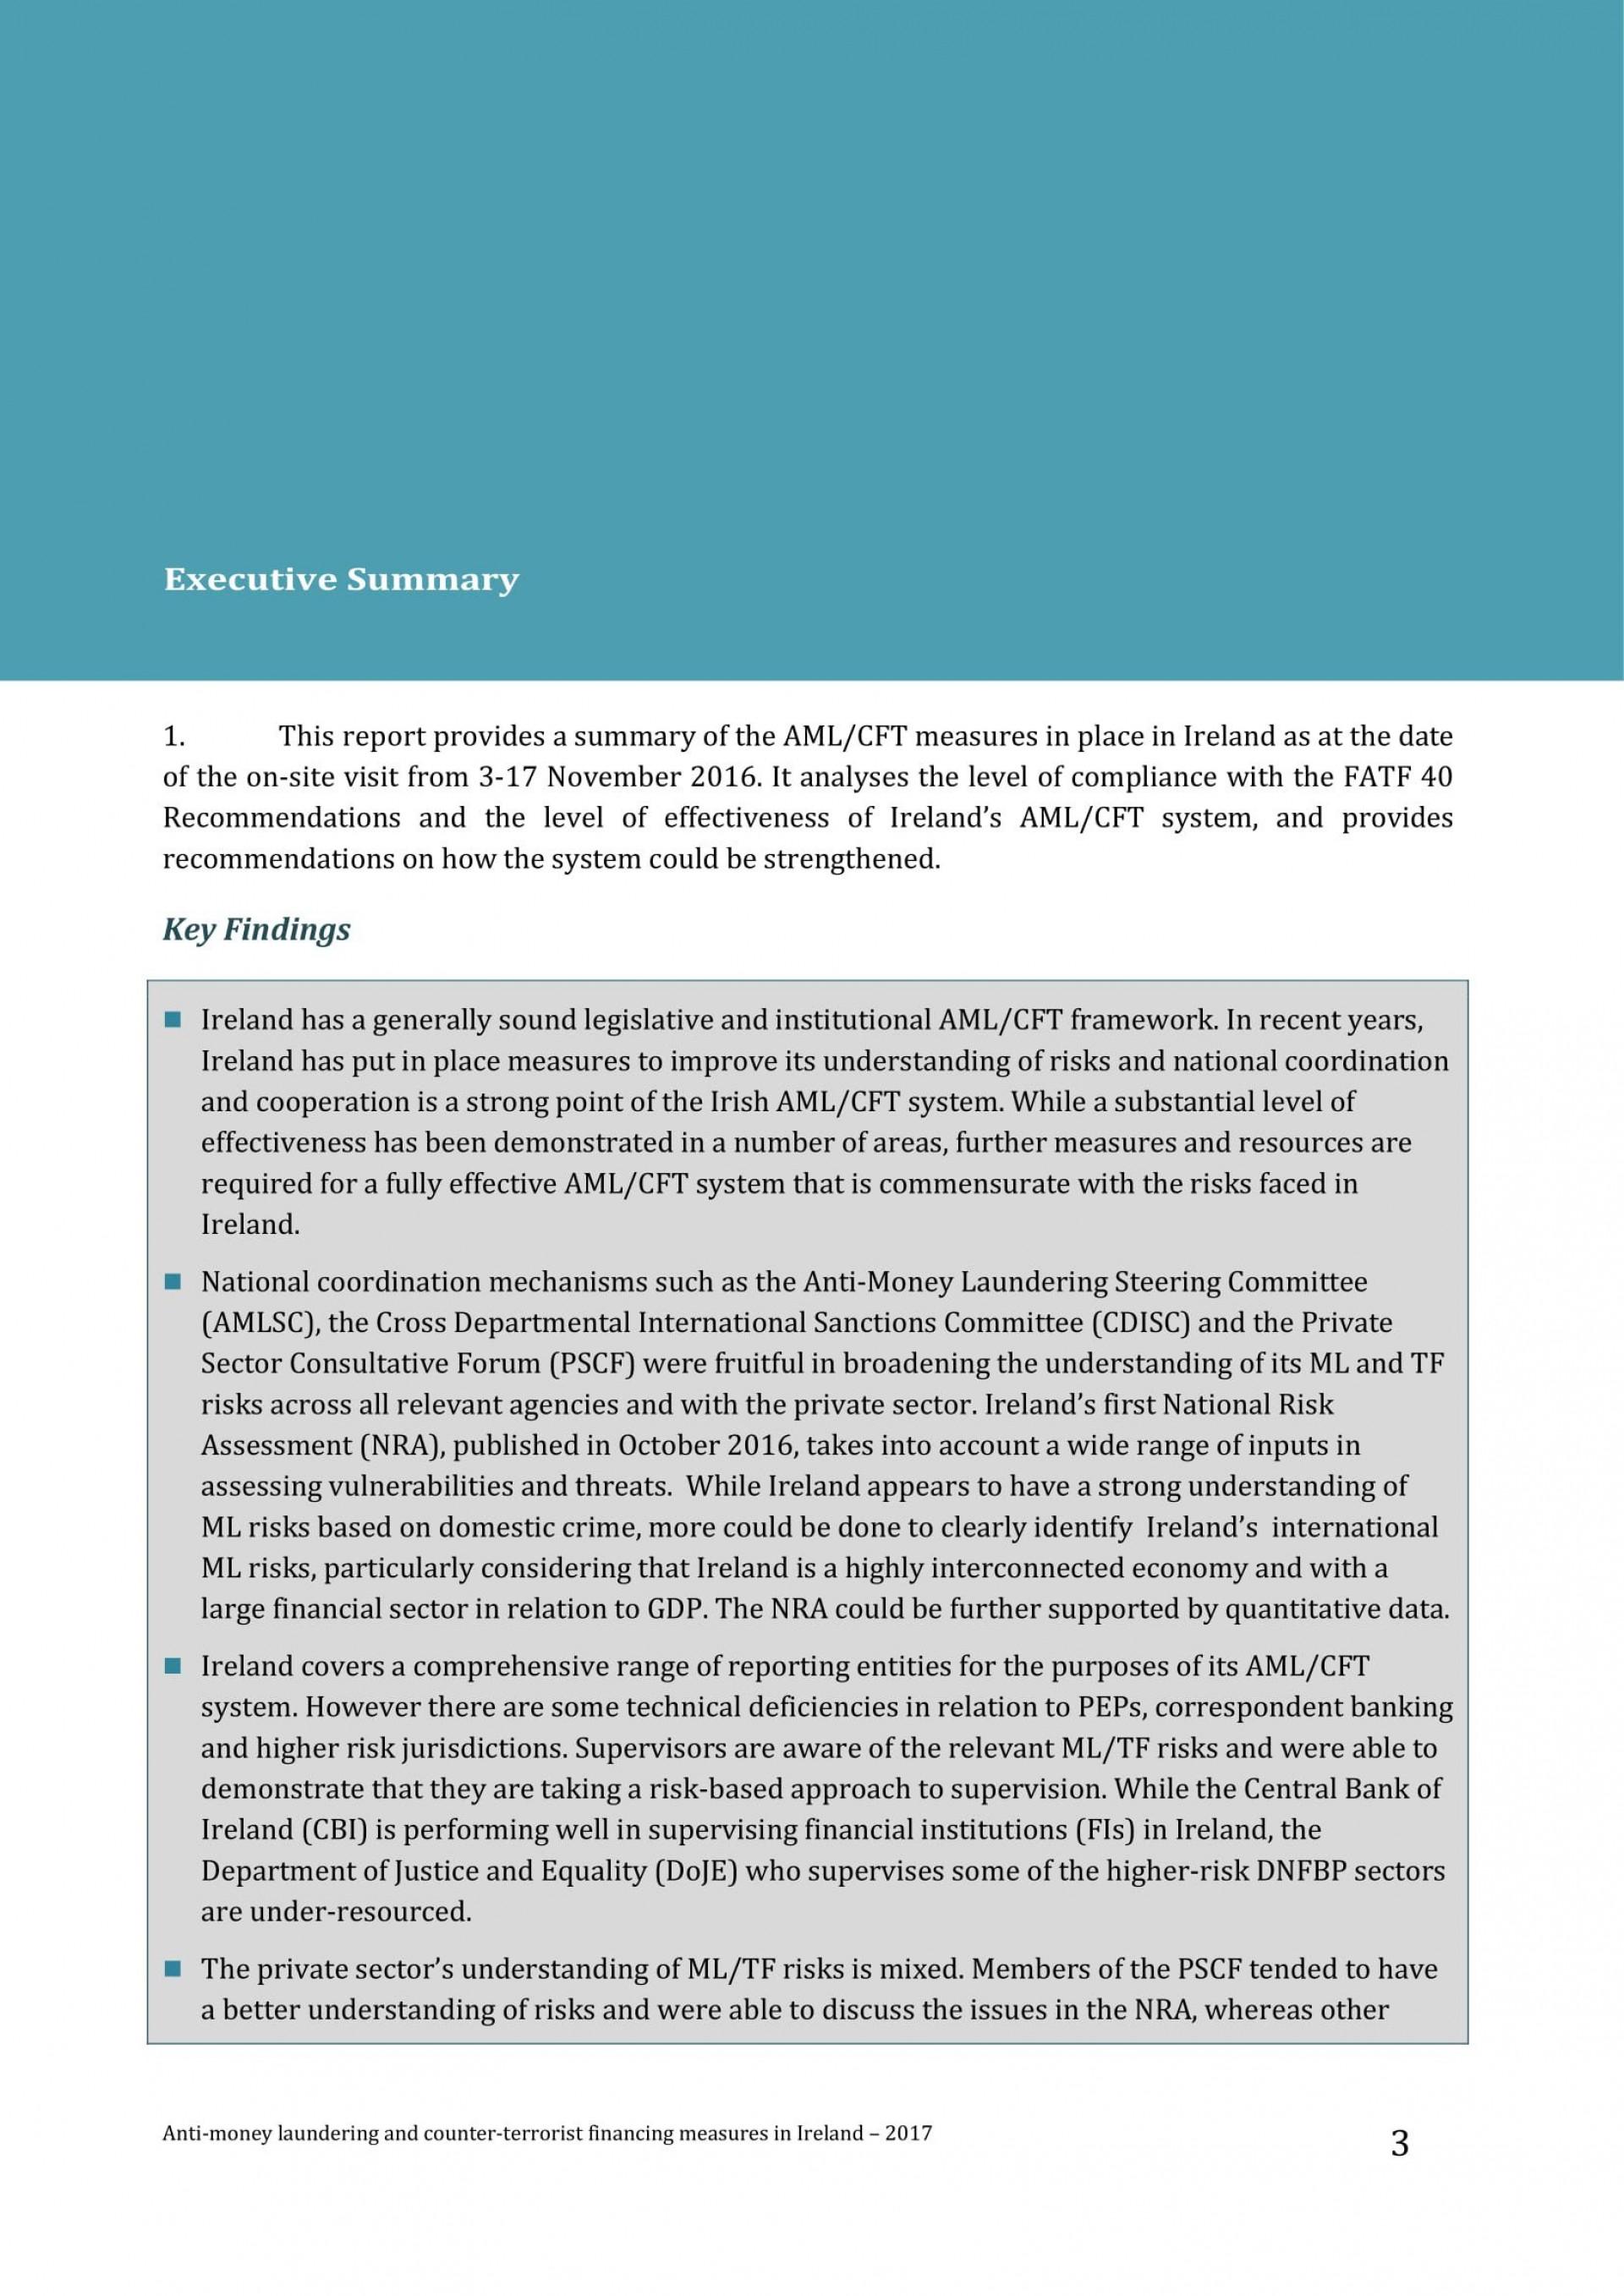 008 Singular Executive Summary Report Word Template High Resolution 1920